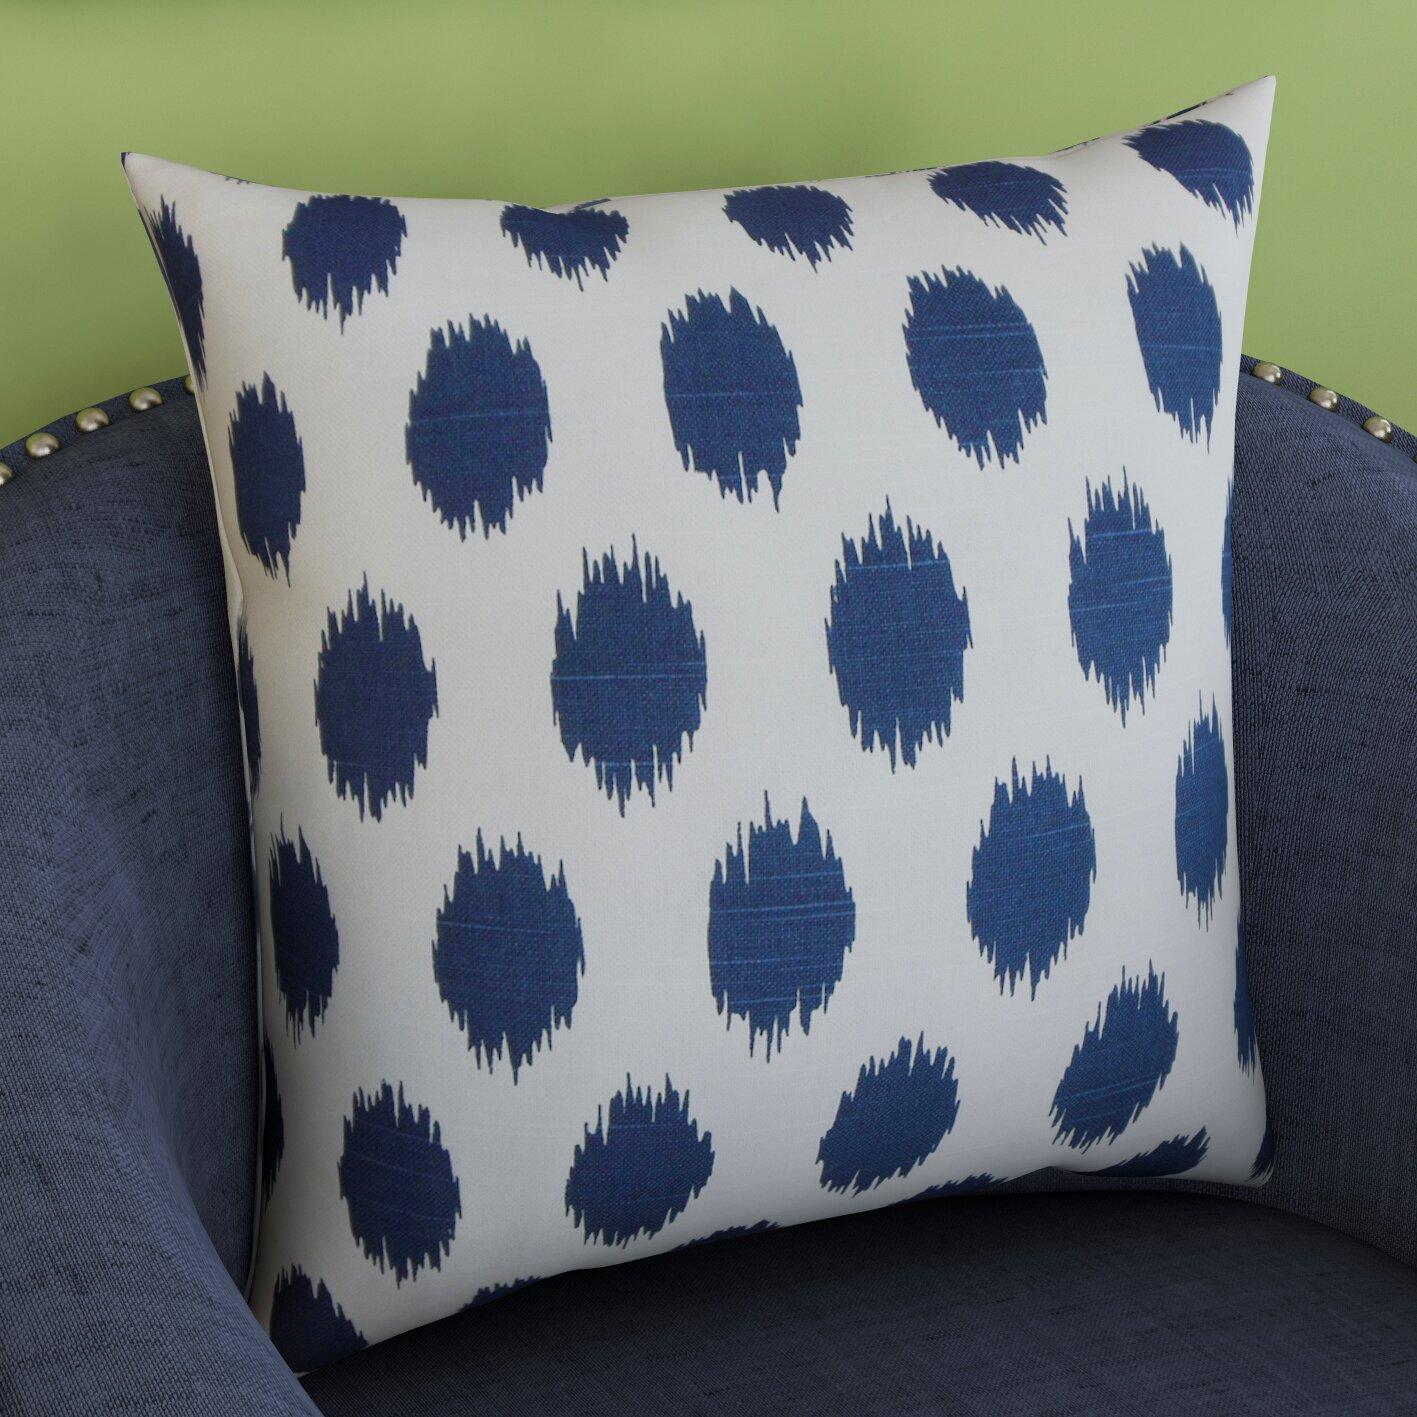 Red Barrel Studio Brickyard Cotton Throw Pillow & Reviews Wayfair